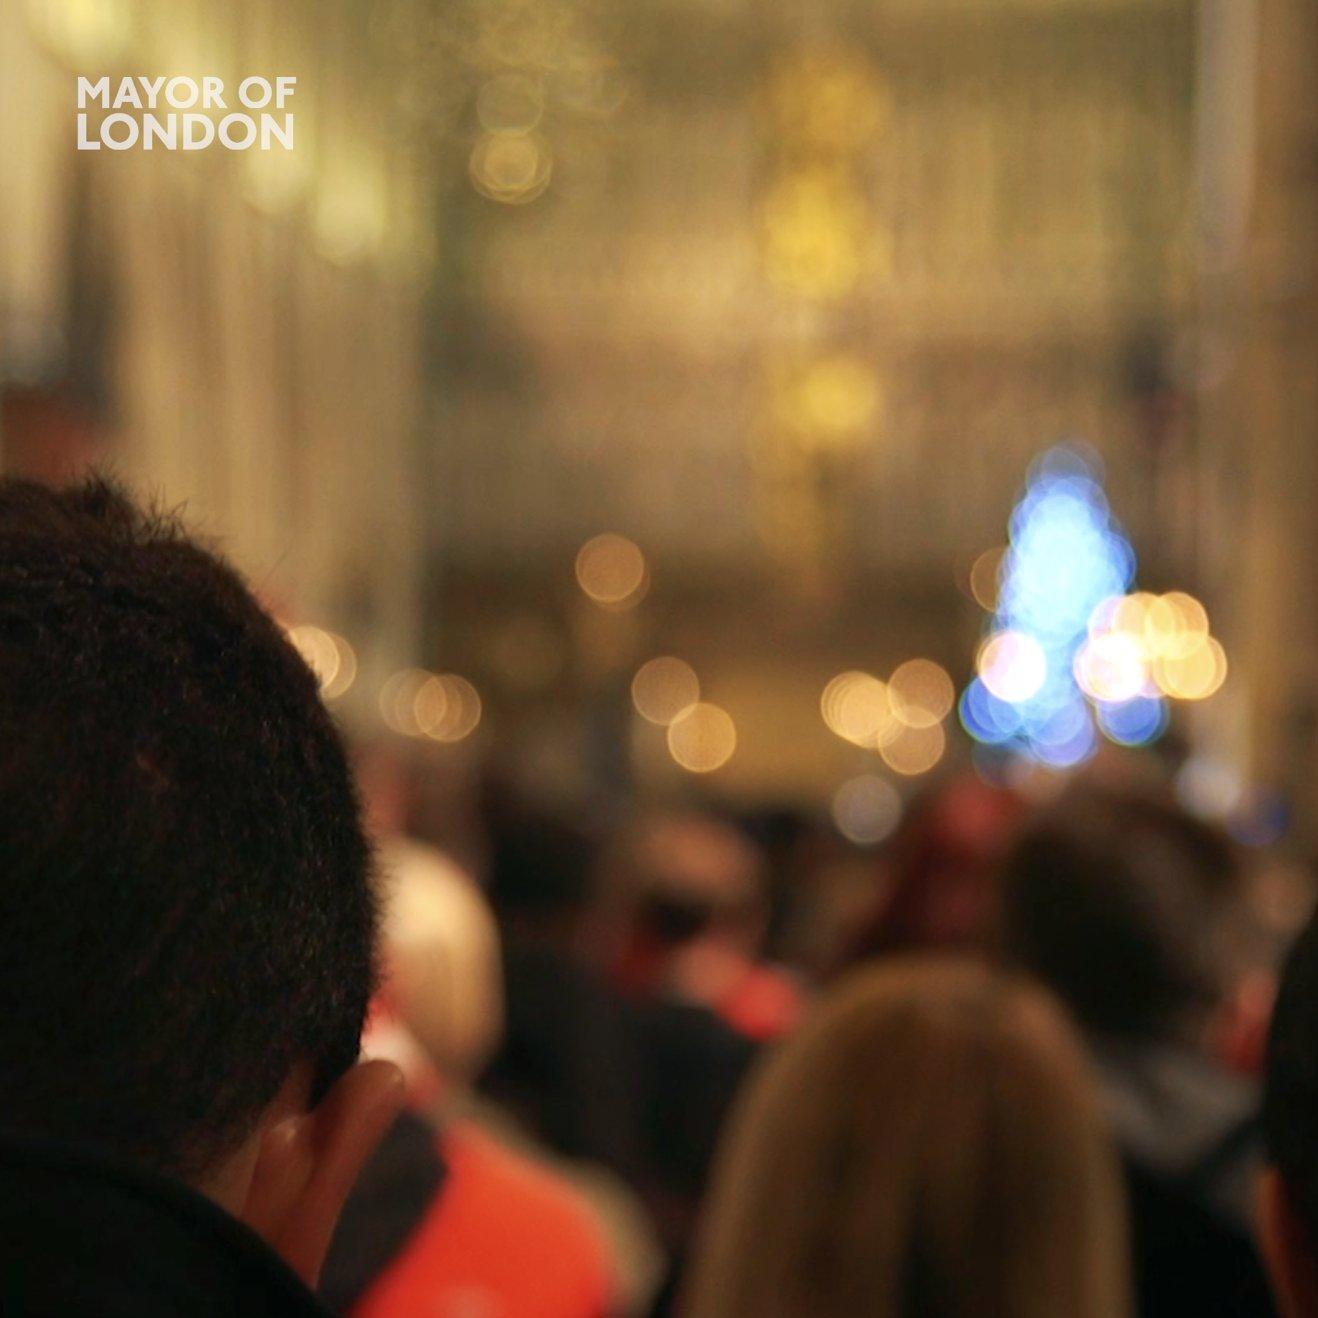 Thank you @SouthwarkCathed for a wonderful GLA Christmas Carol Service last night. https://t.co/bJUoNwUQ2S